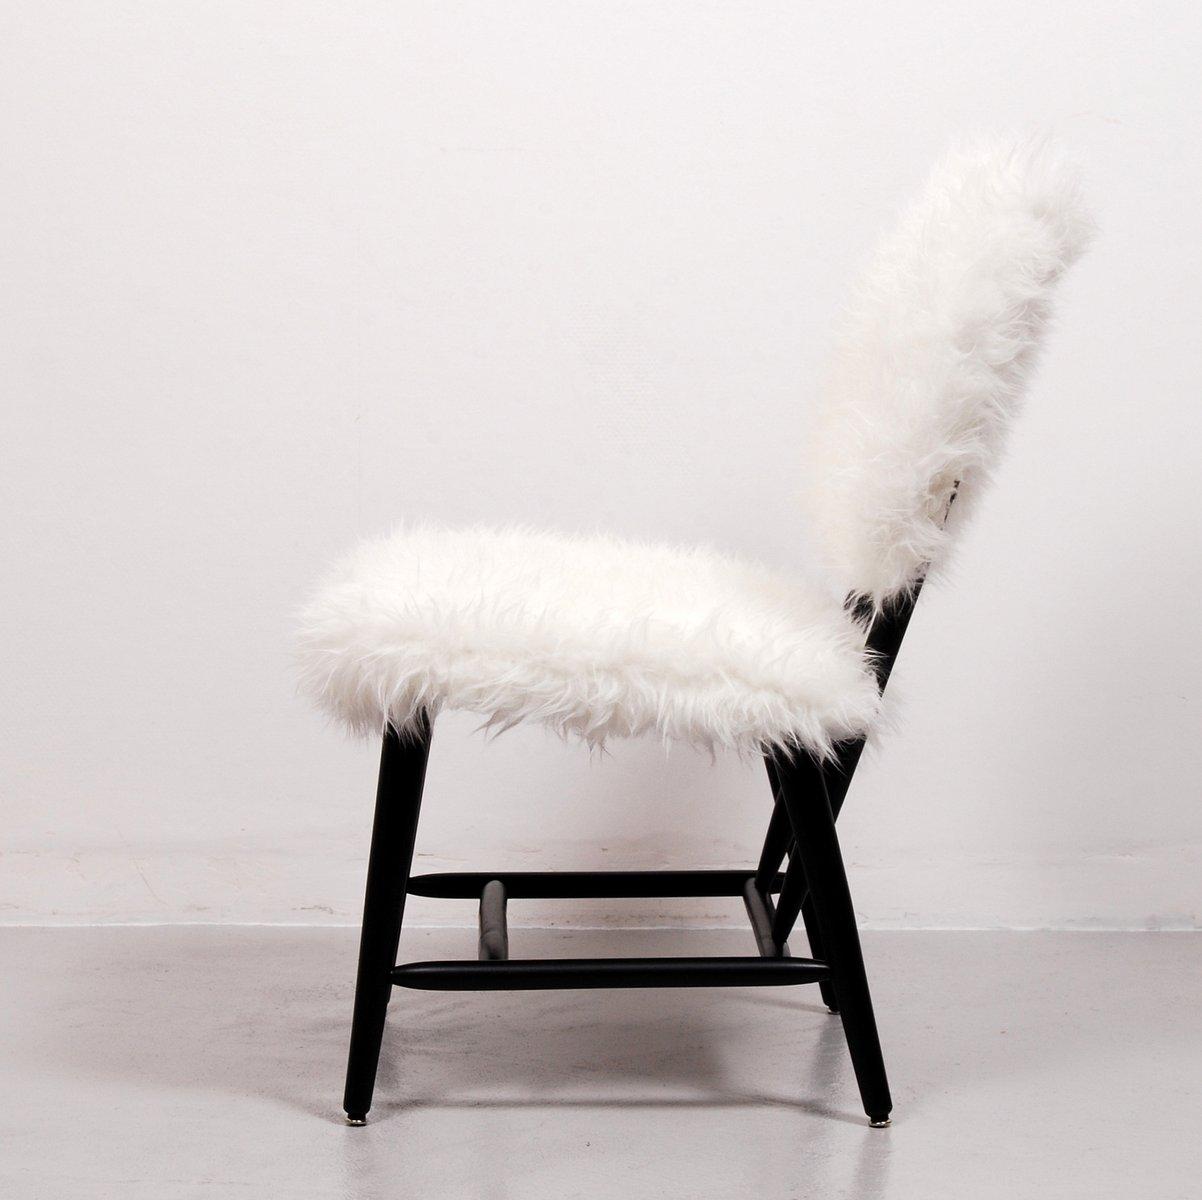 Schwedischer stuhl aus kunstfell 1950er bei pamono kaufen - Kunstfell fur stuhl ...